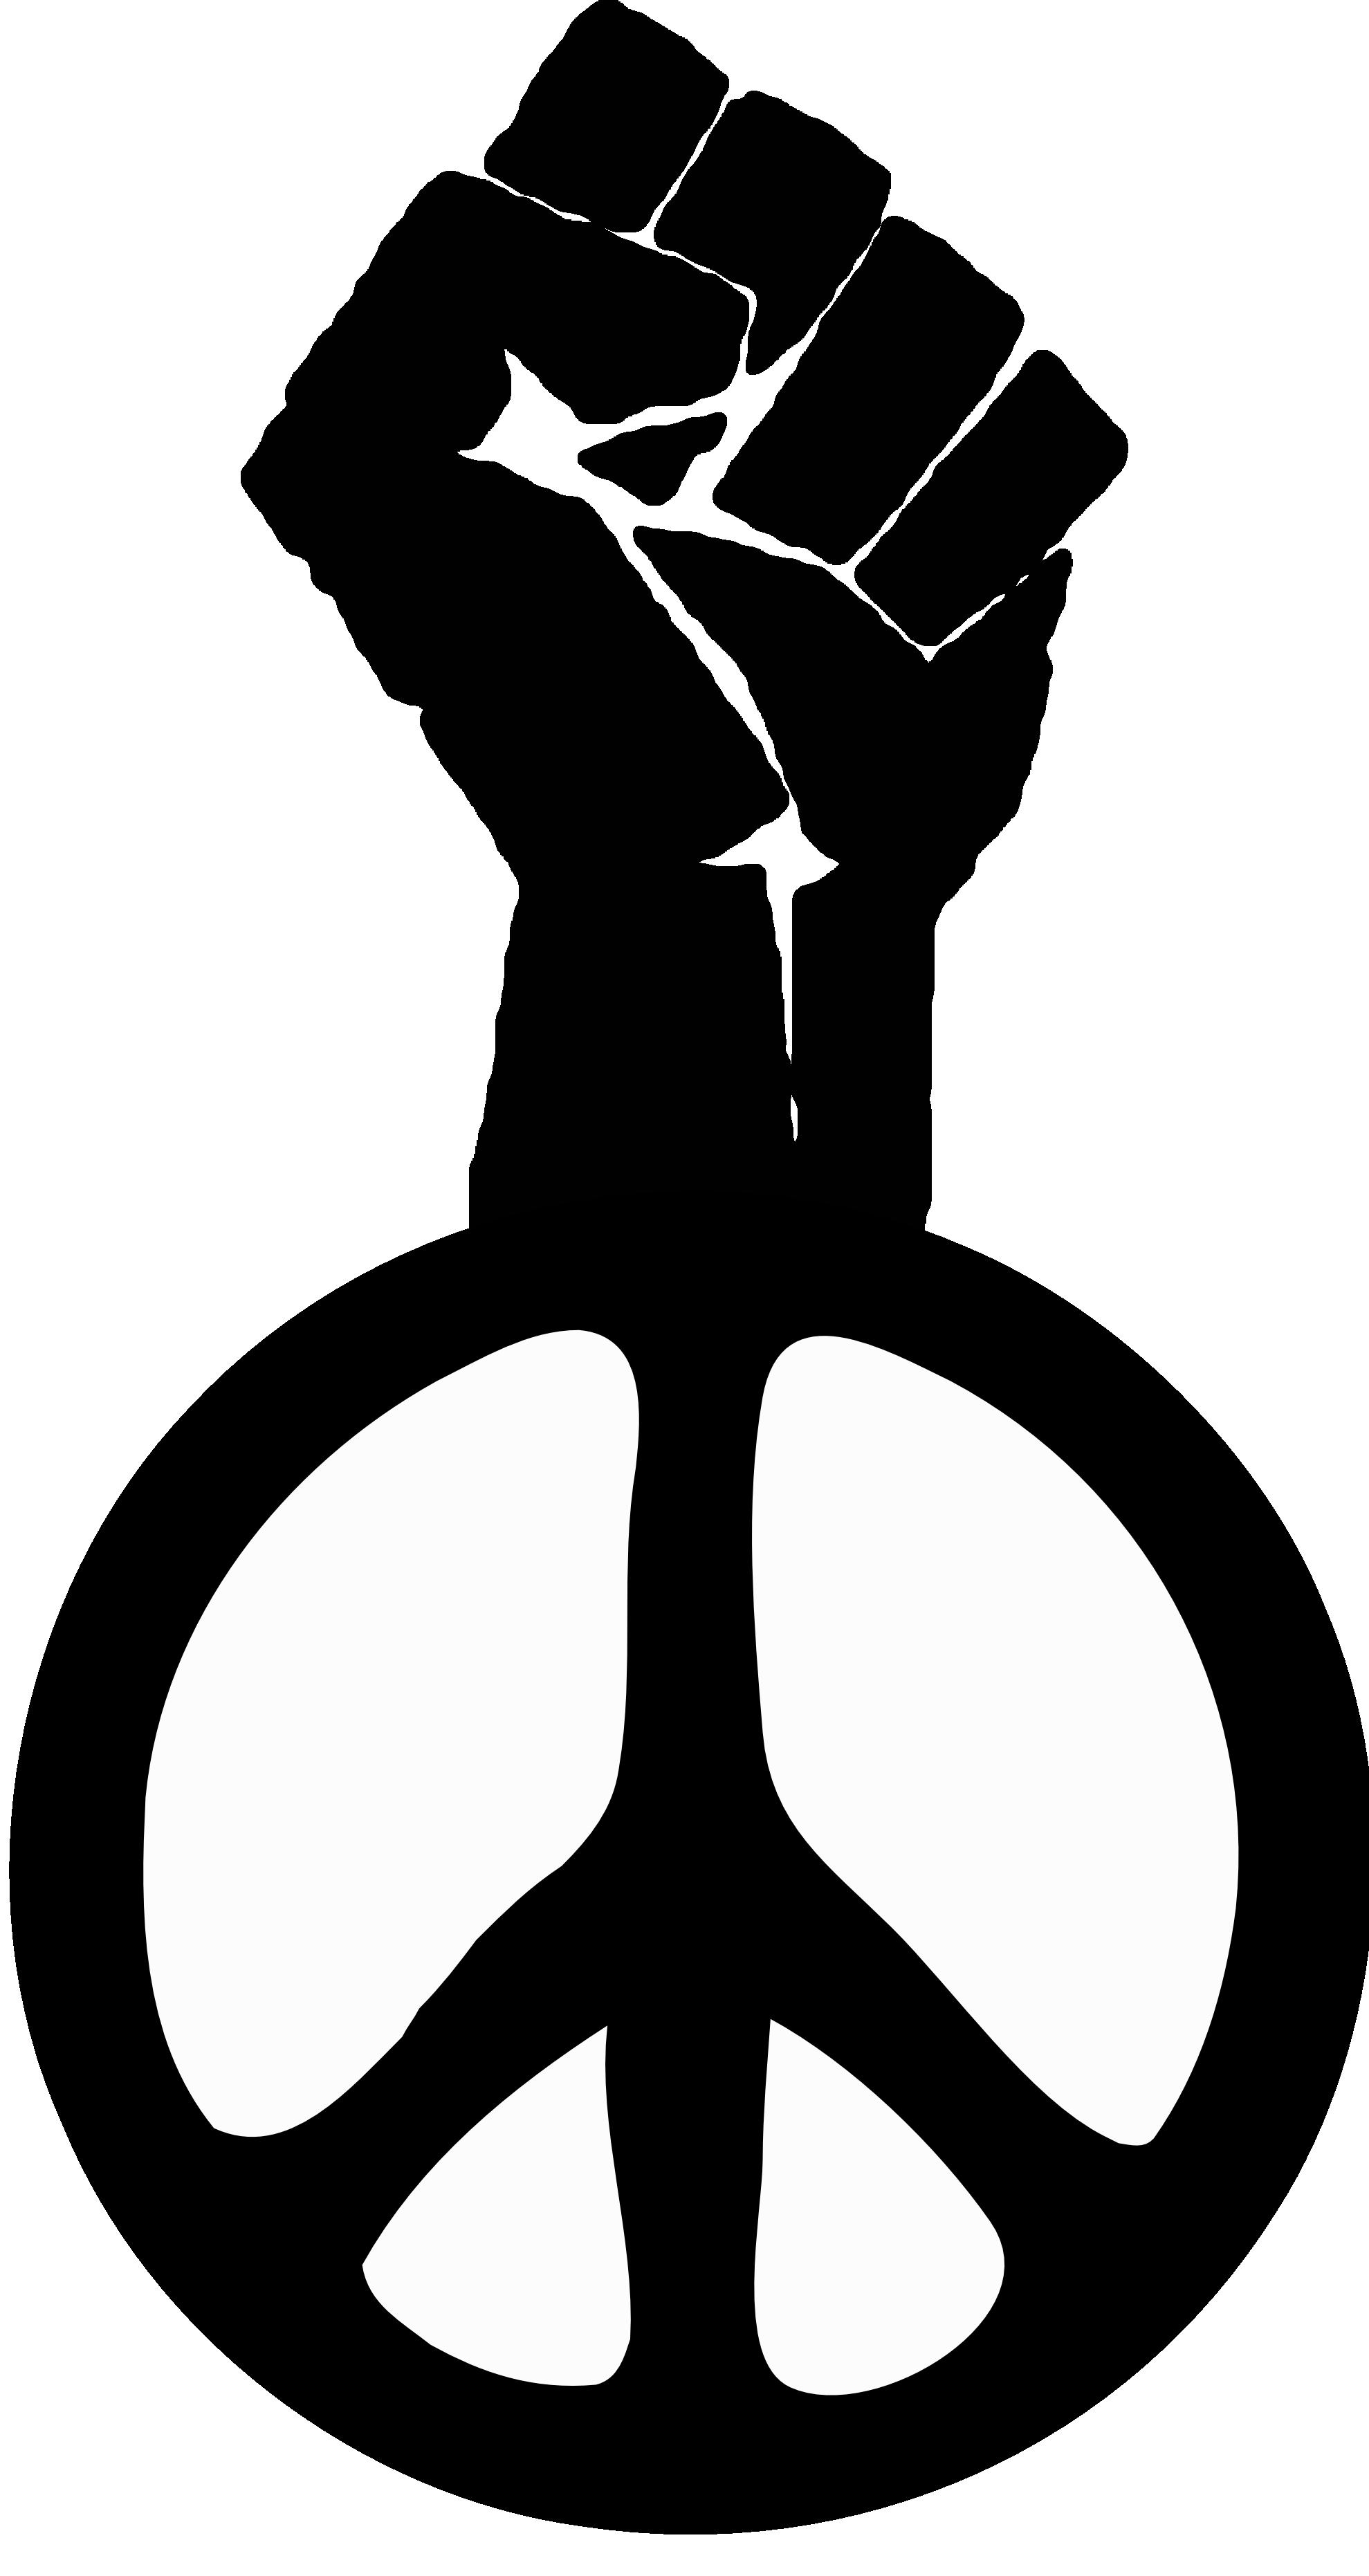 Fist Symbol - ClipArt Best